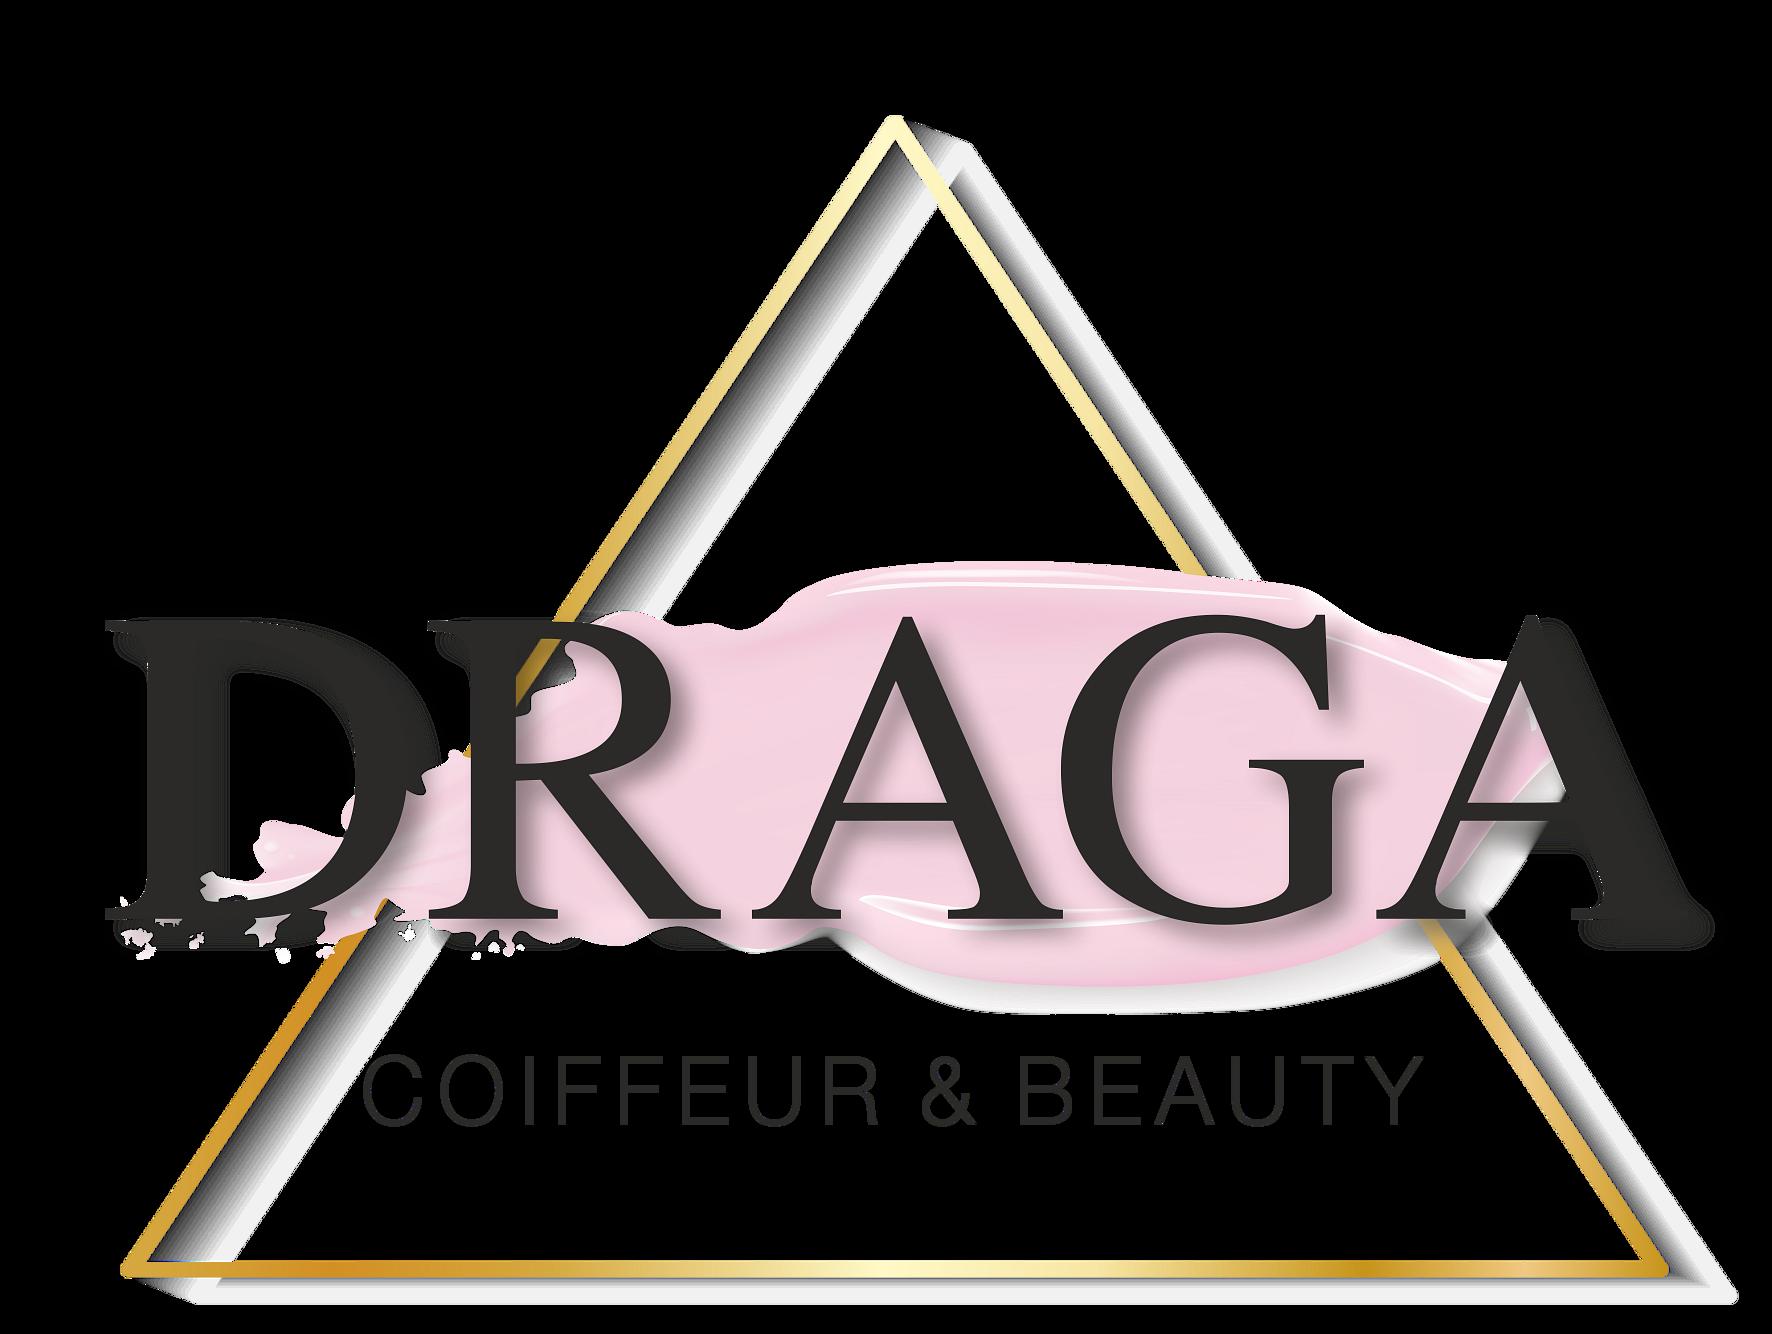 Draga Coiffure Beauty